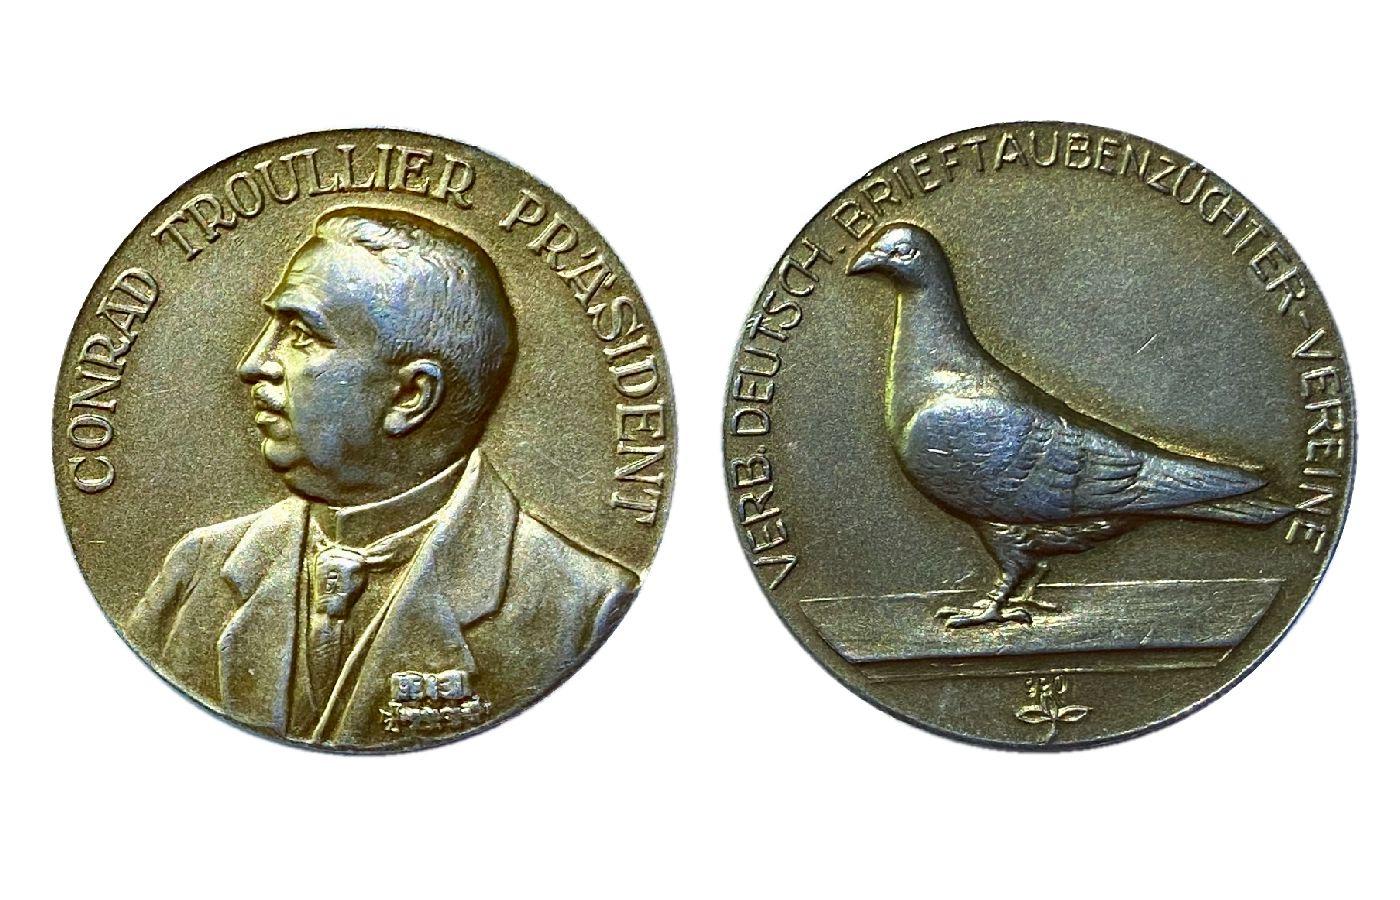 Medaille in Silber vergoldet mit Präsident Conrad Troullier